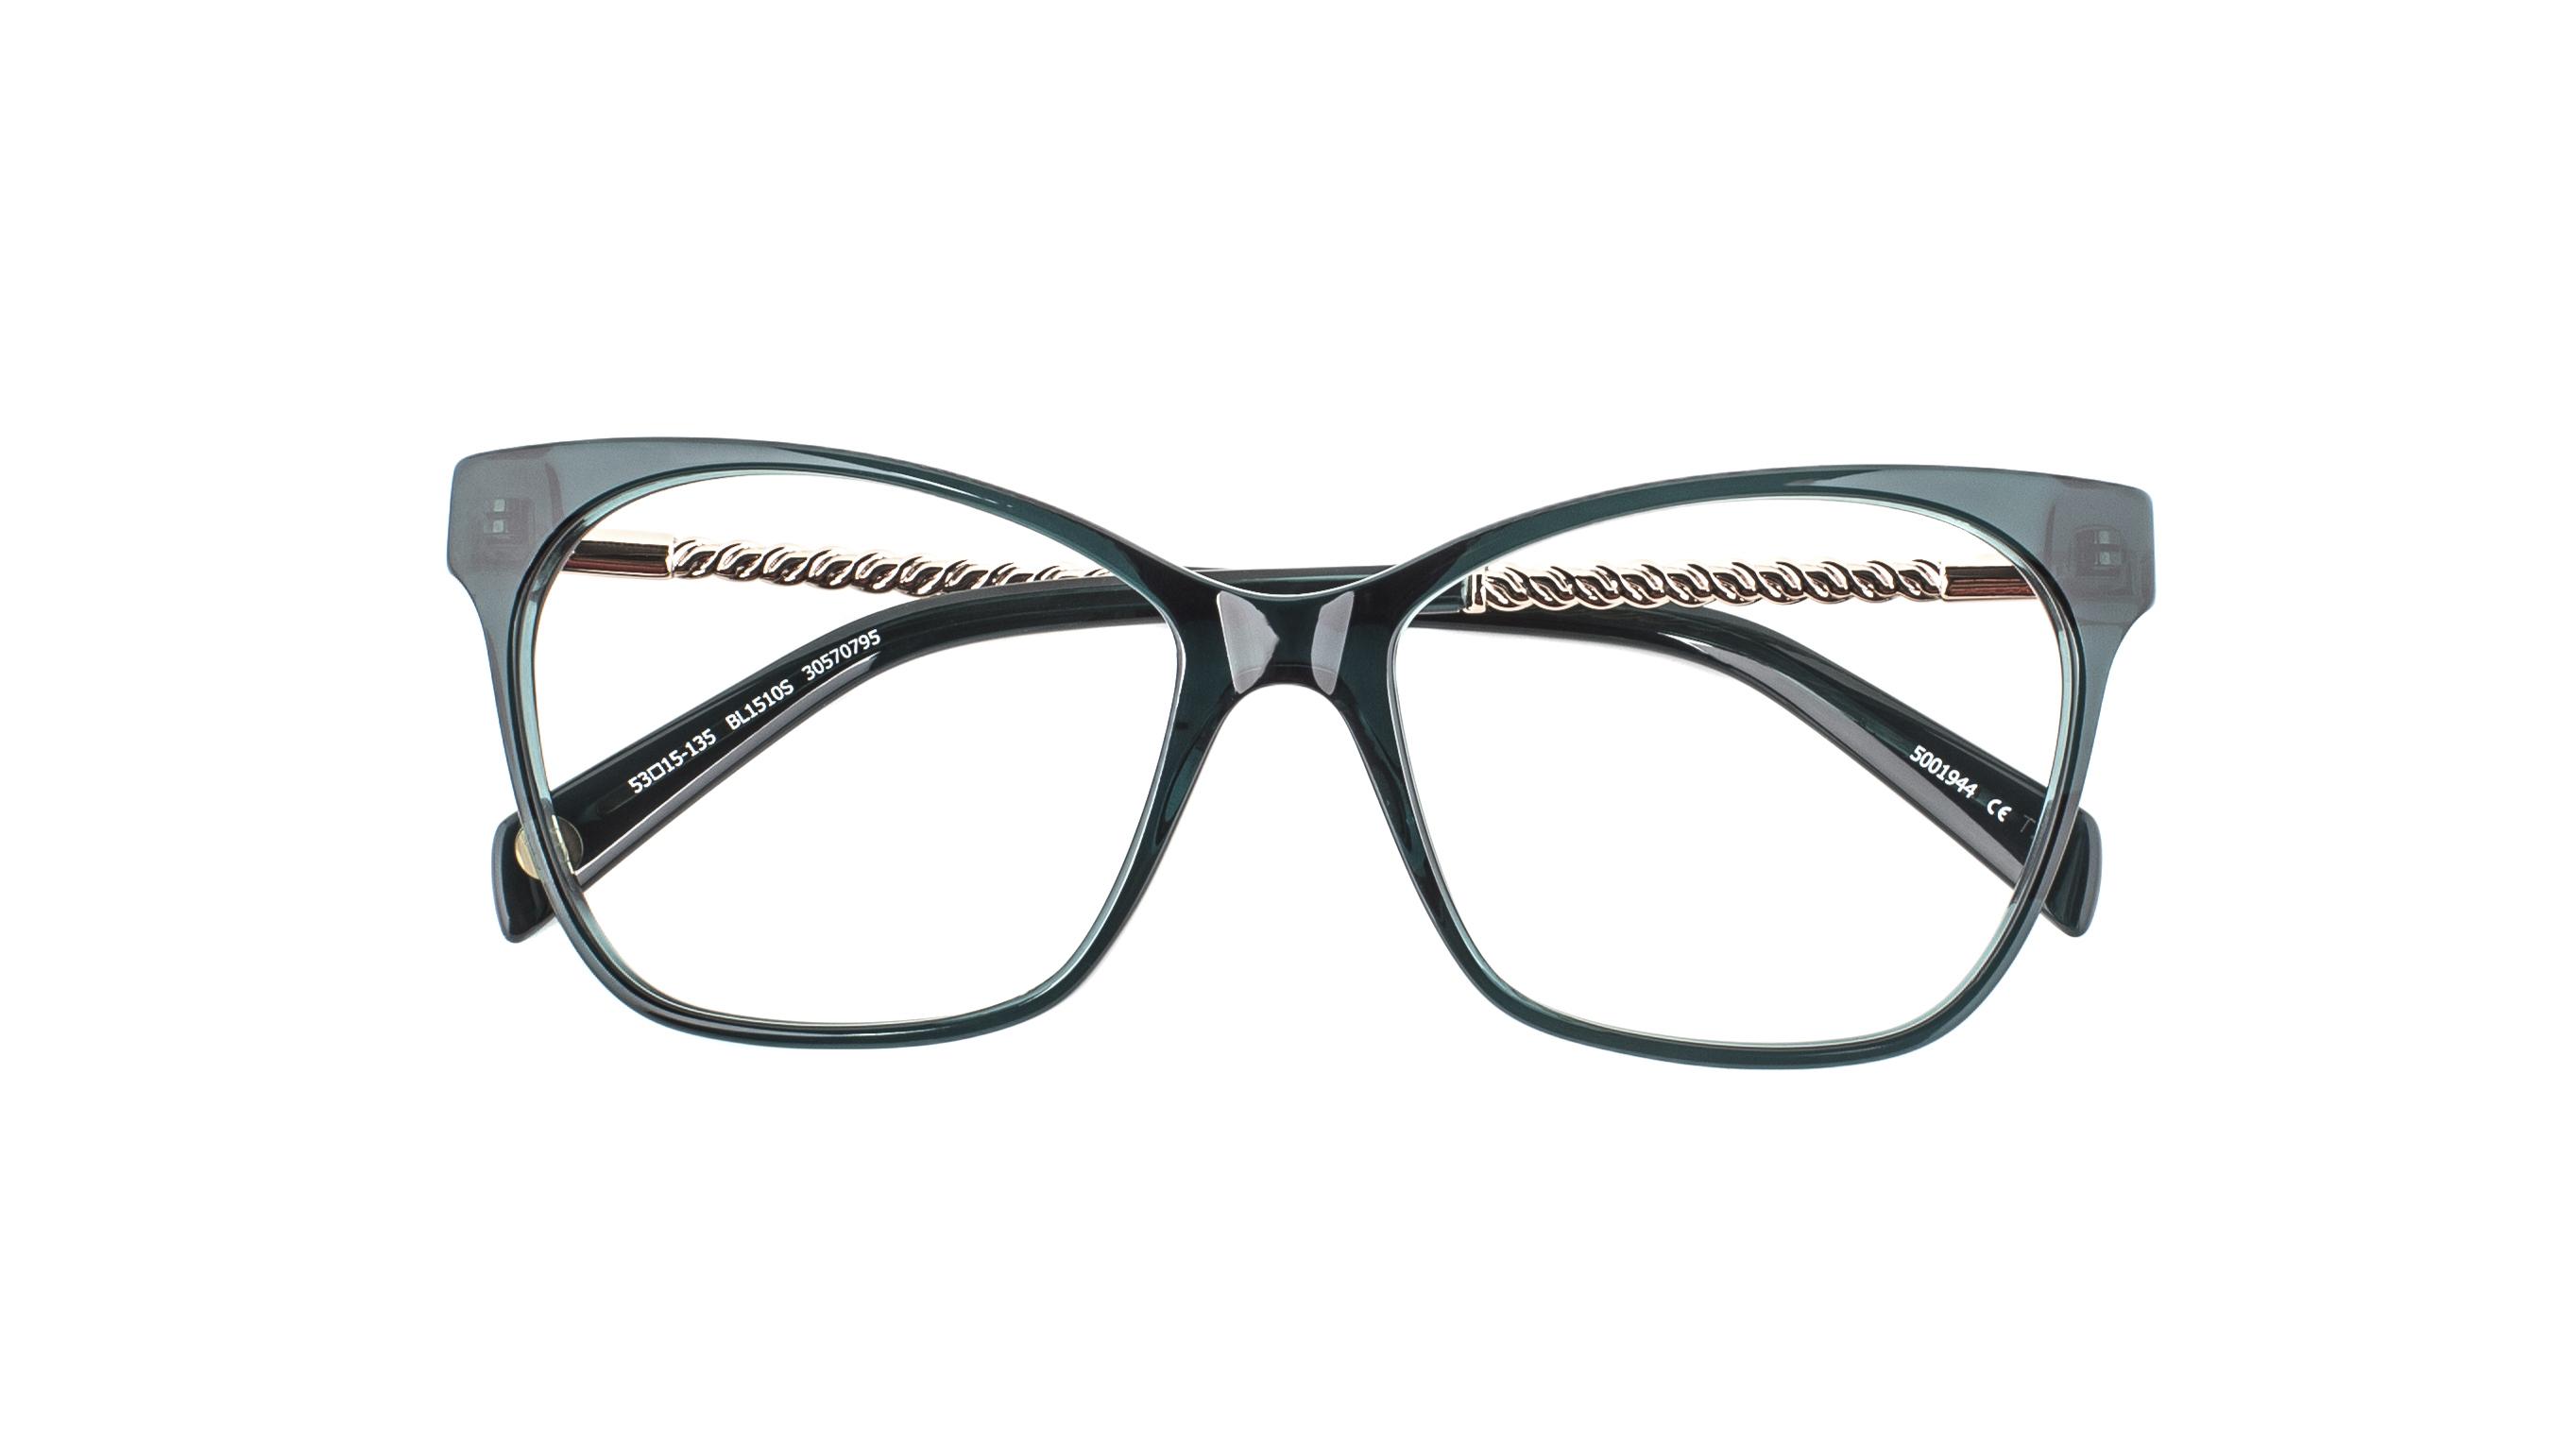 Balmain x Specsavers BL150S 30570795 - RRP 2 pairs single vision $459 (2)